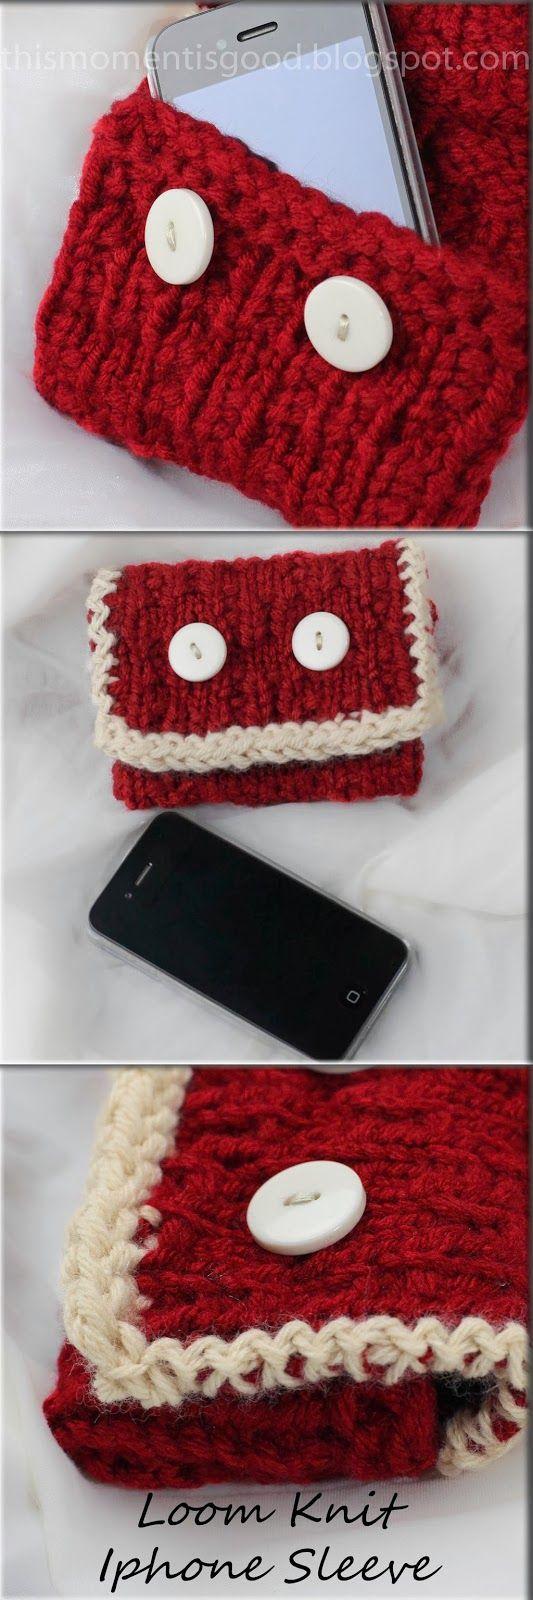 FREE LOOM KNIT IPHONE SLEEVE PATTERN... | Loom knitting patterns ...